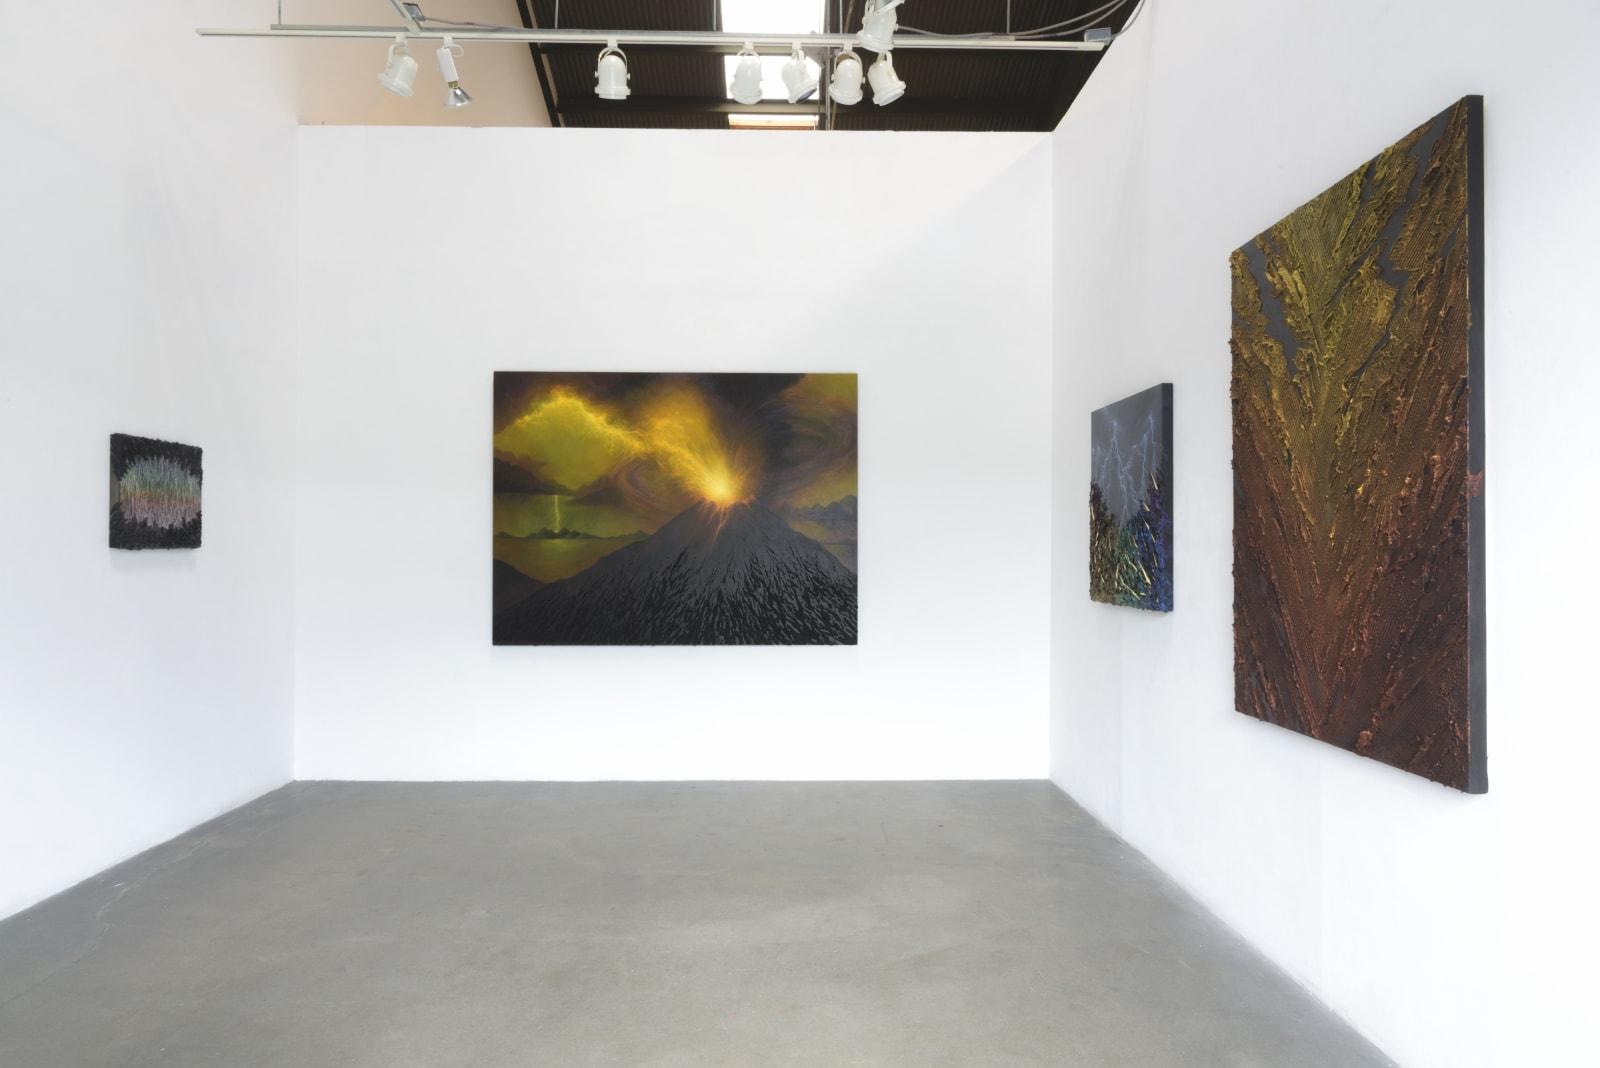 Kelly Berg installation view